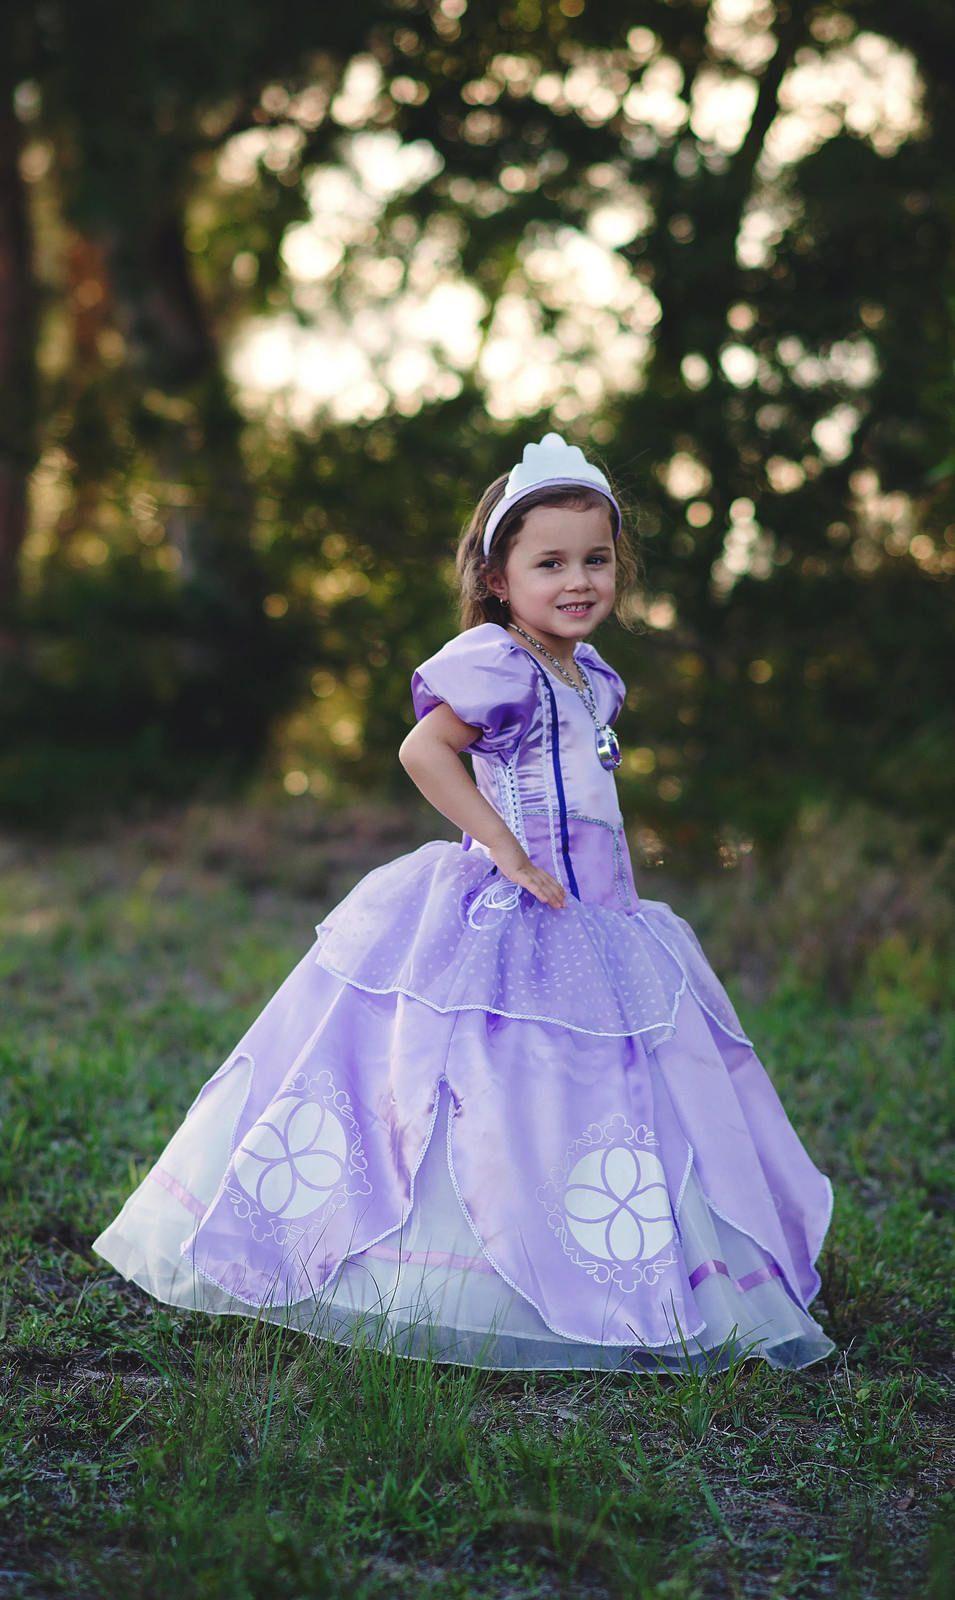 963e37119 Sofia Dress Disney Princess Inspired Sofia the First Costume - Kids, Girls,  Todd Disney' first little girl princess, Sophia the First!